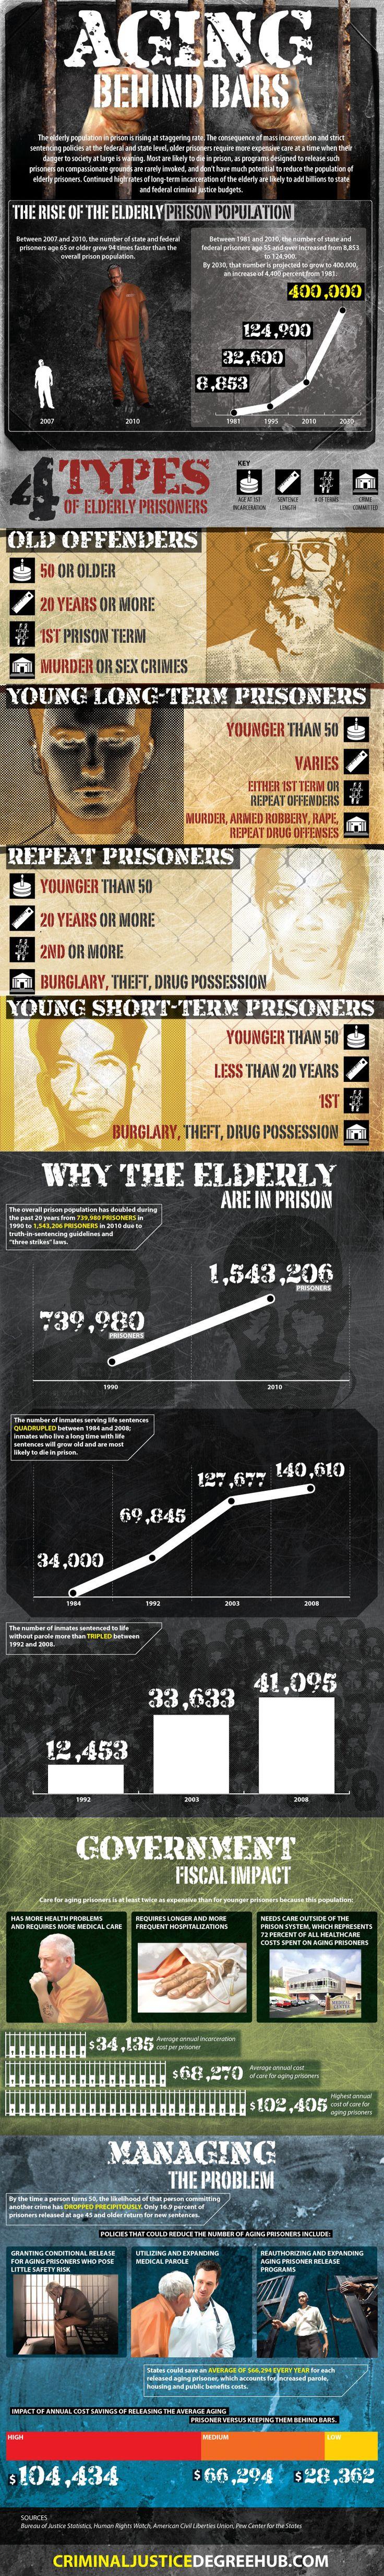 US Prison Population and Sentences